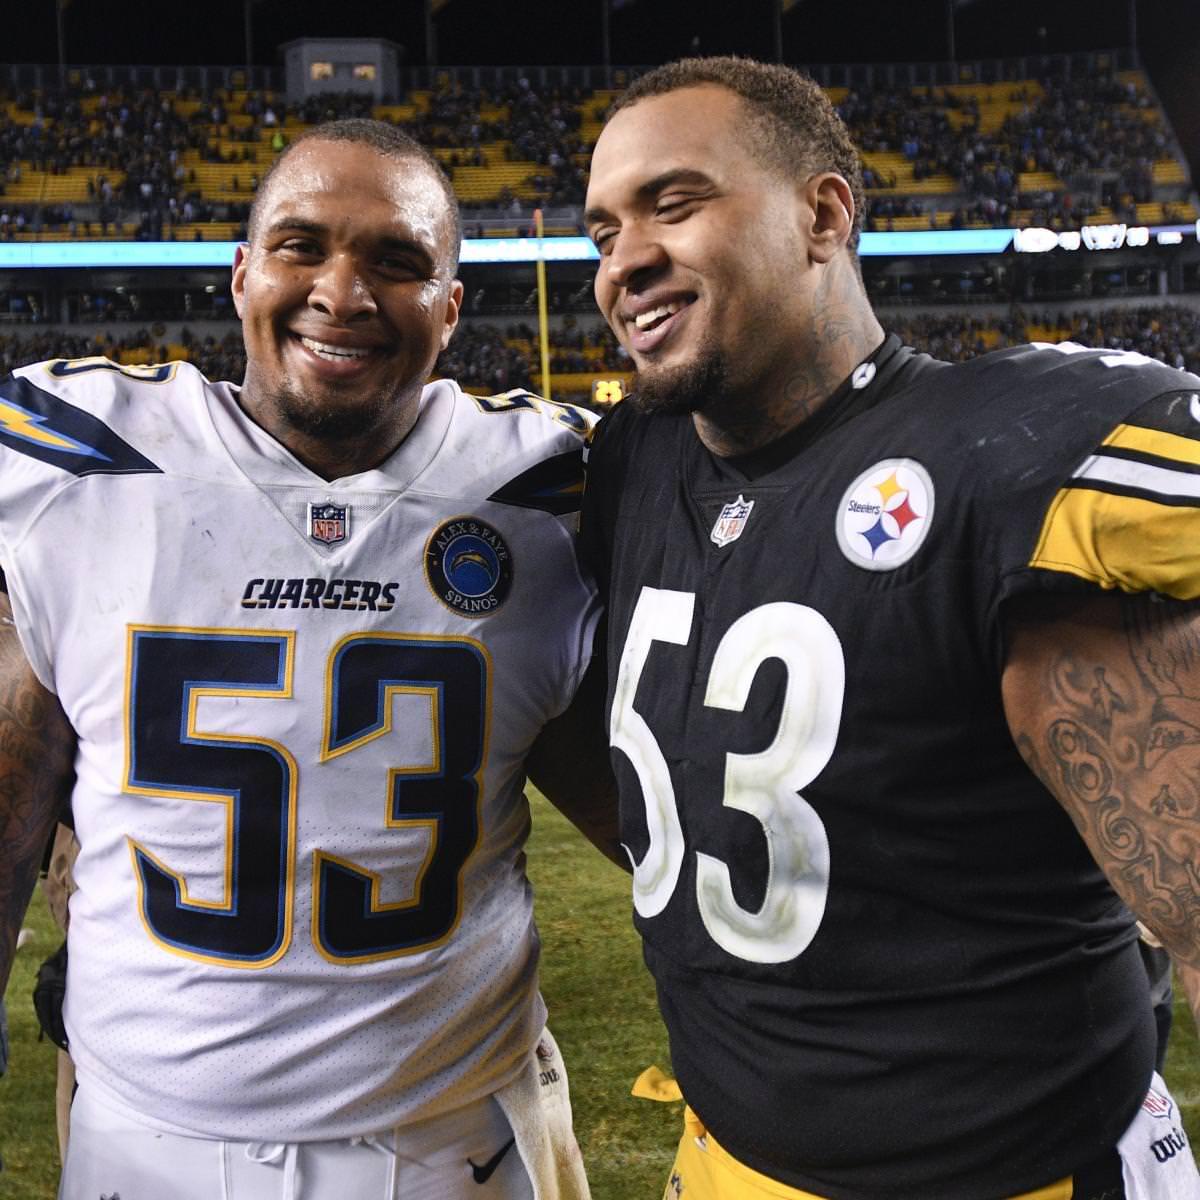 Chargers 'Mike, Steelers' Maurkice Pouncey anunciam aposentadoria da NFL